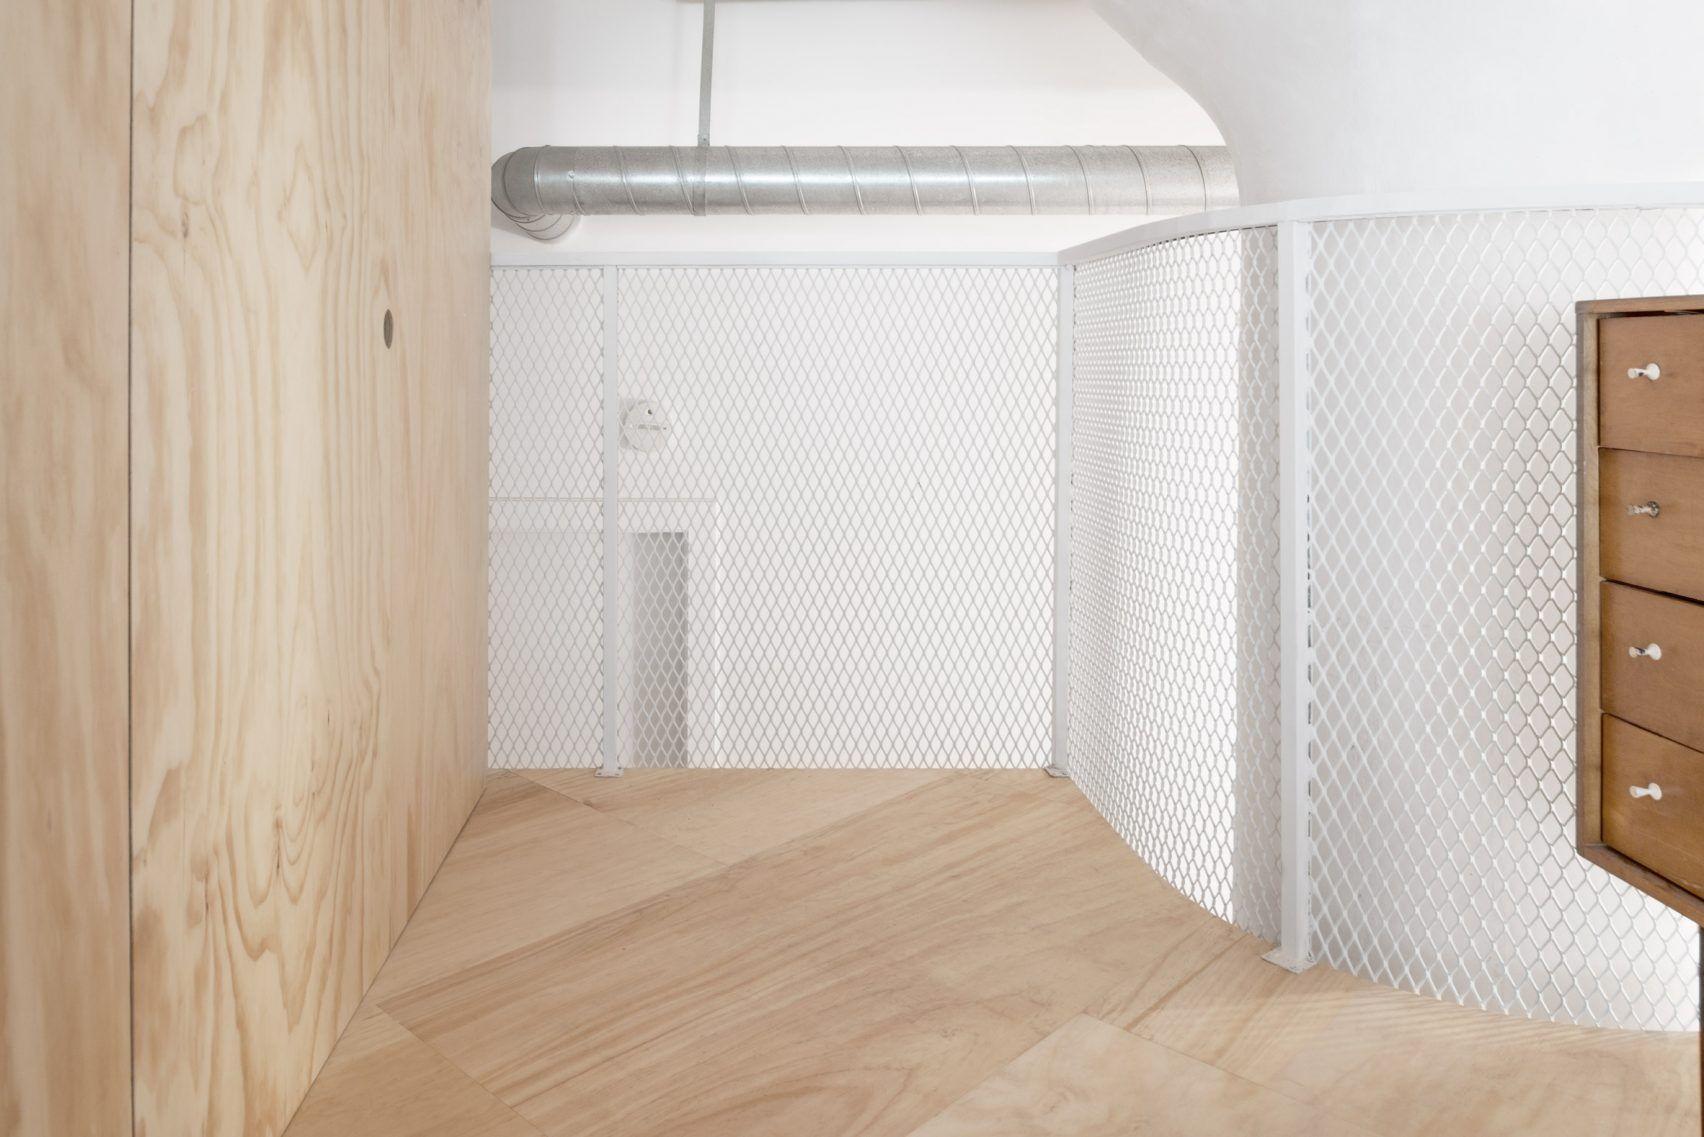 New Affiliates, Bed-Stuy, loft renovation, plywood